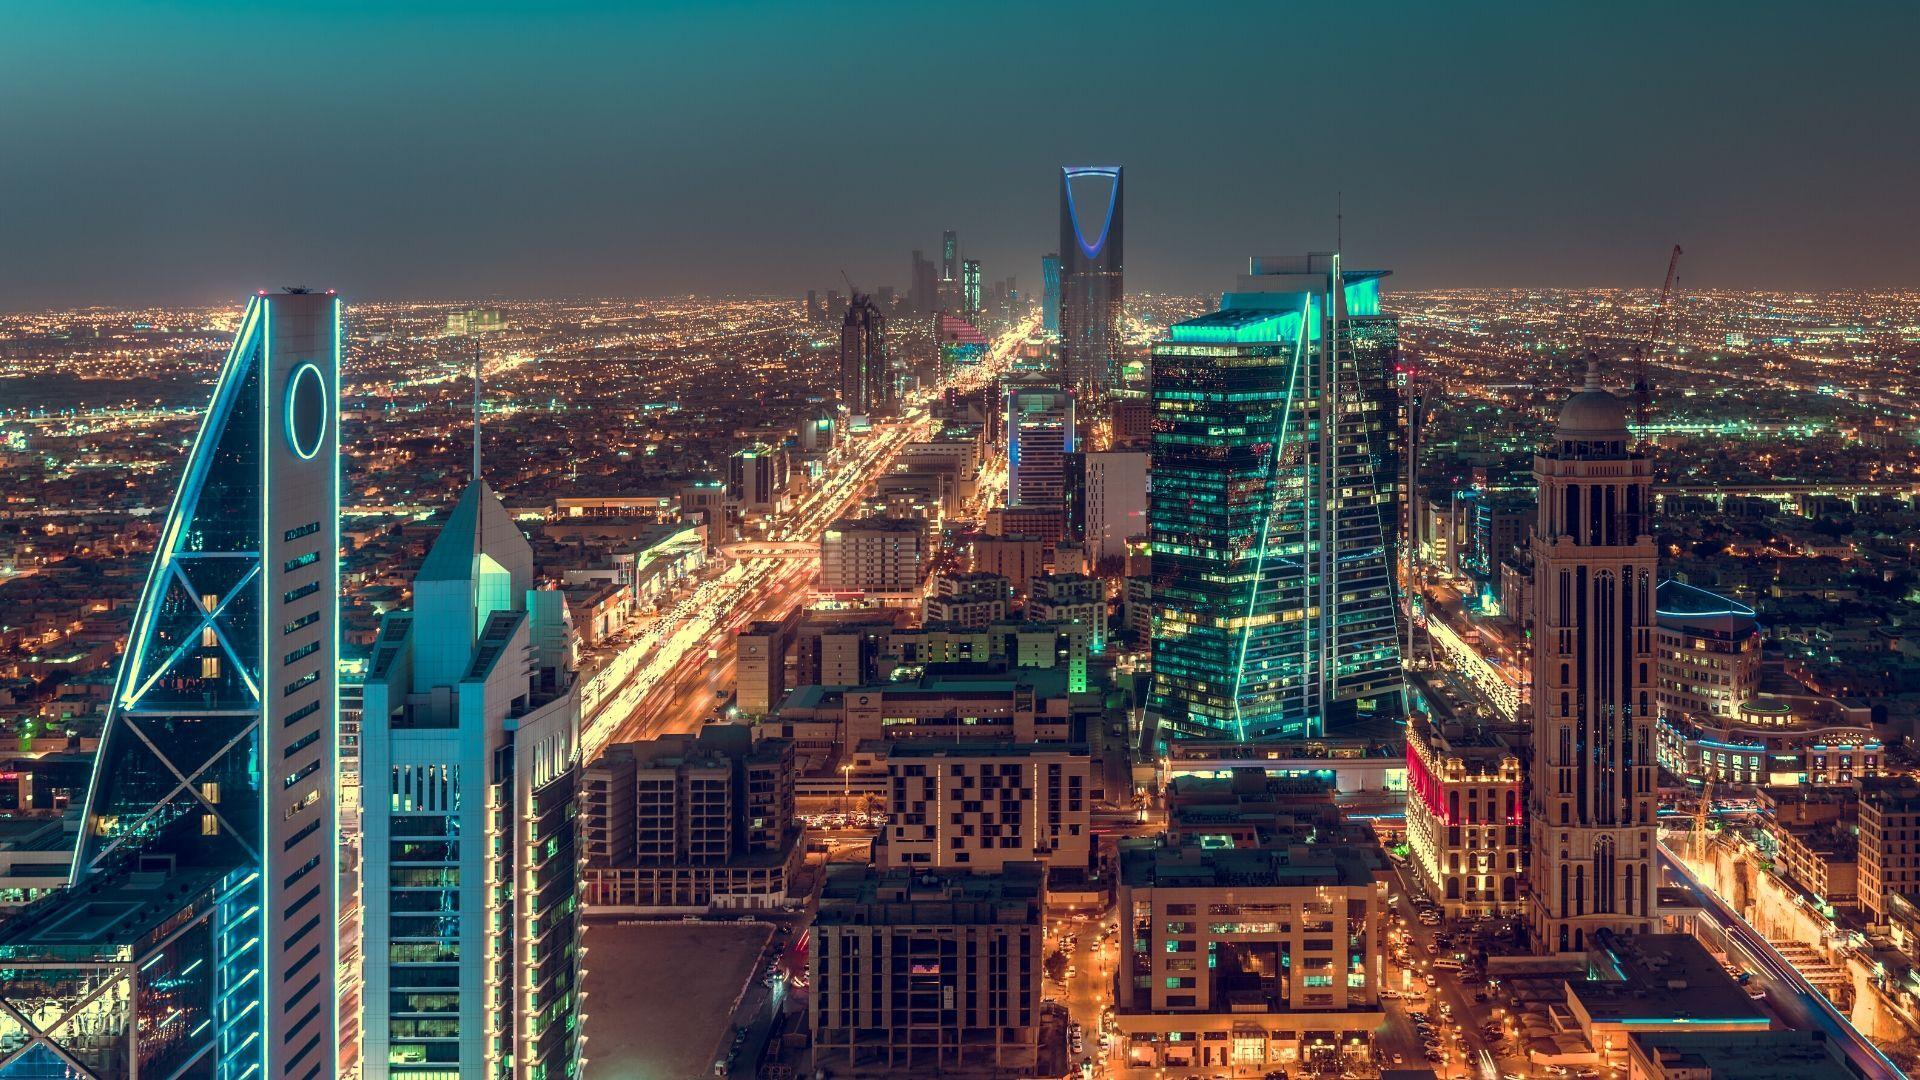 Saudi Arabia To Enforce 24-Hour Lockdown During Eid al-Fitr